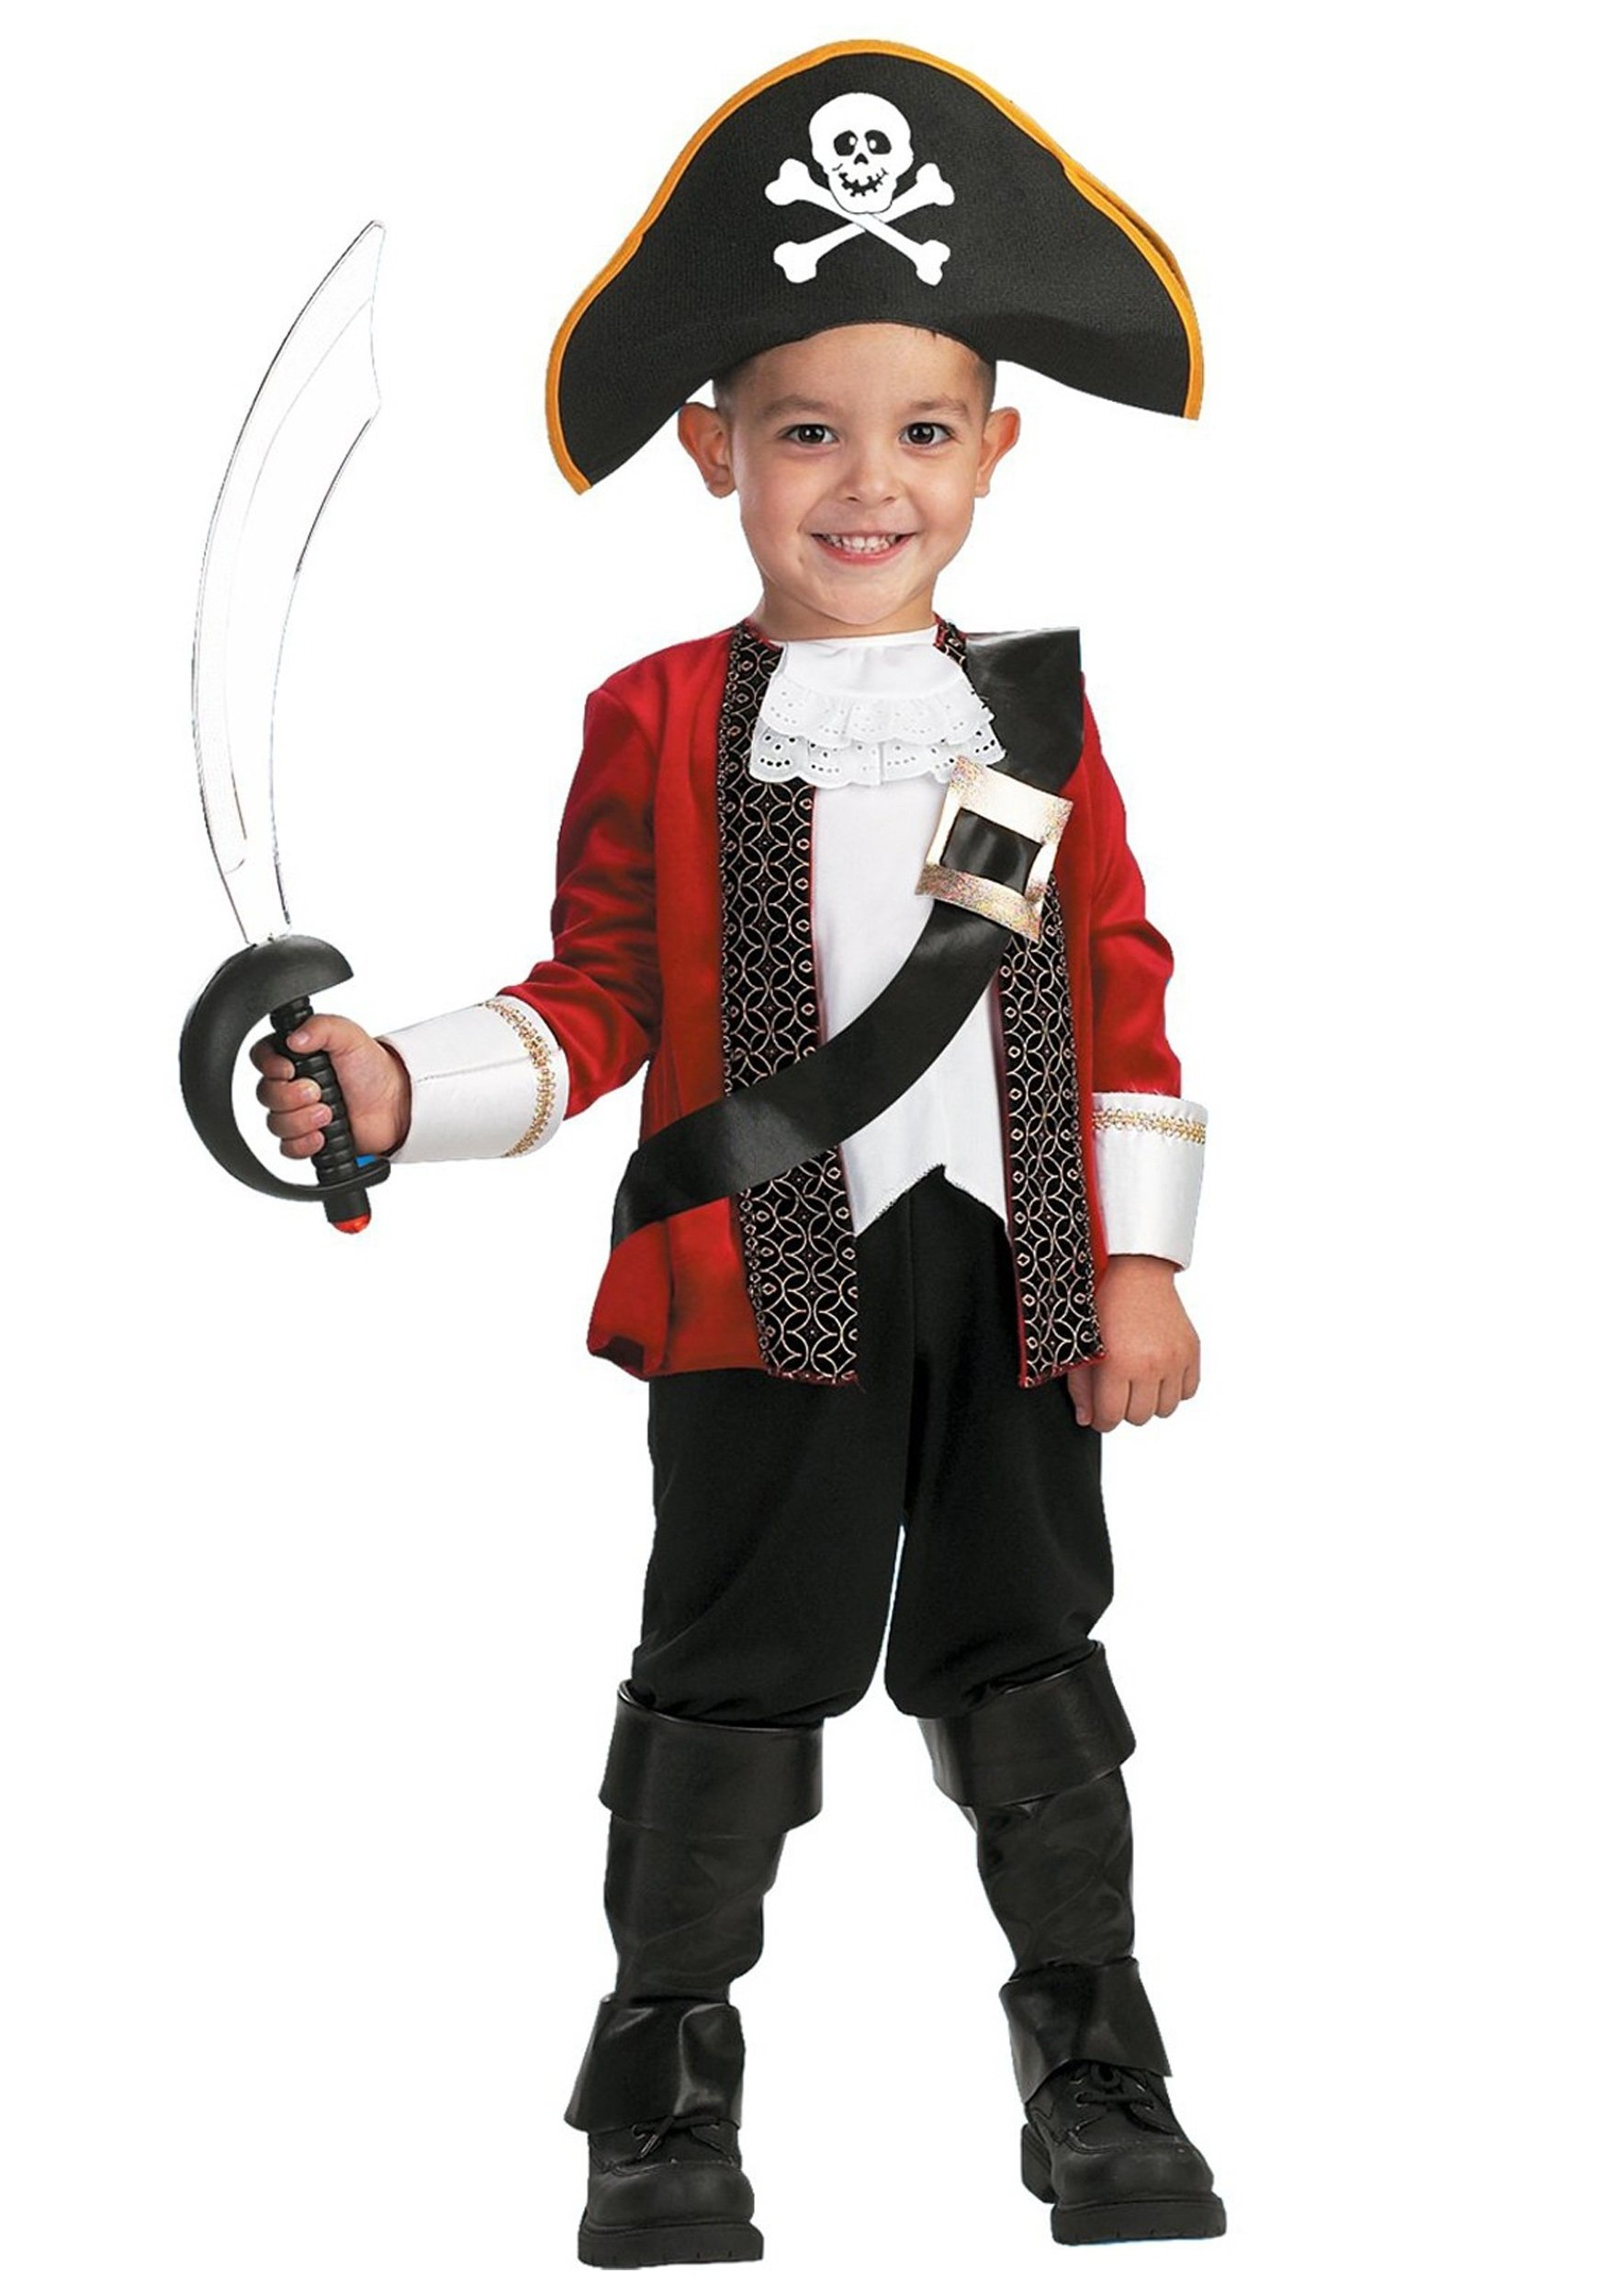 10 Great Pirate Costume Ideas For Kids el capitan child pirate costume 2020